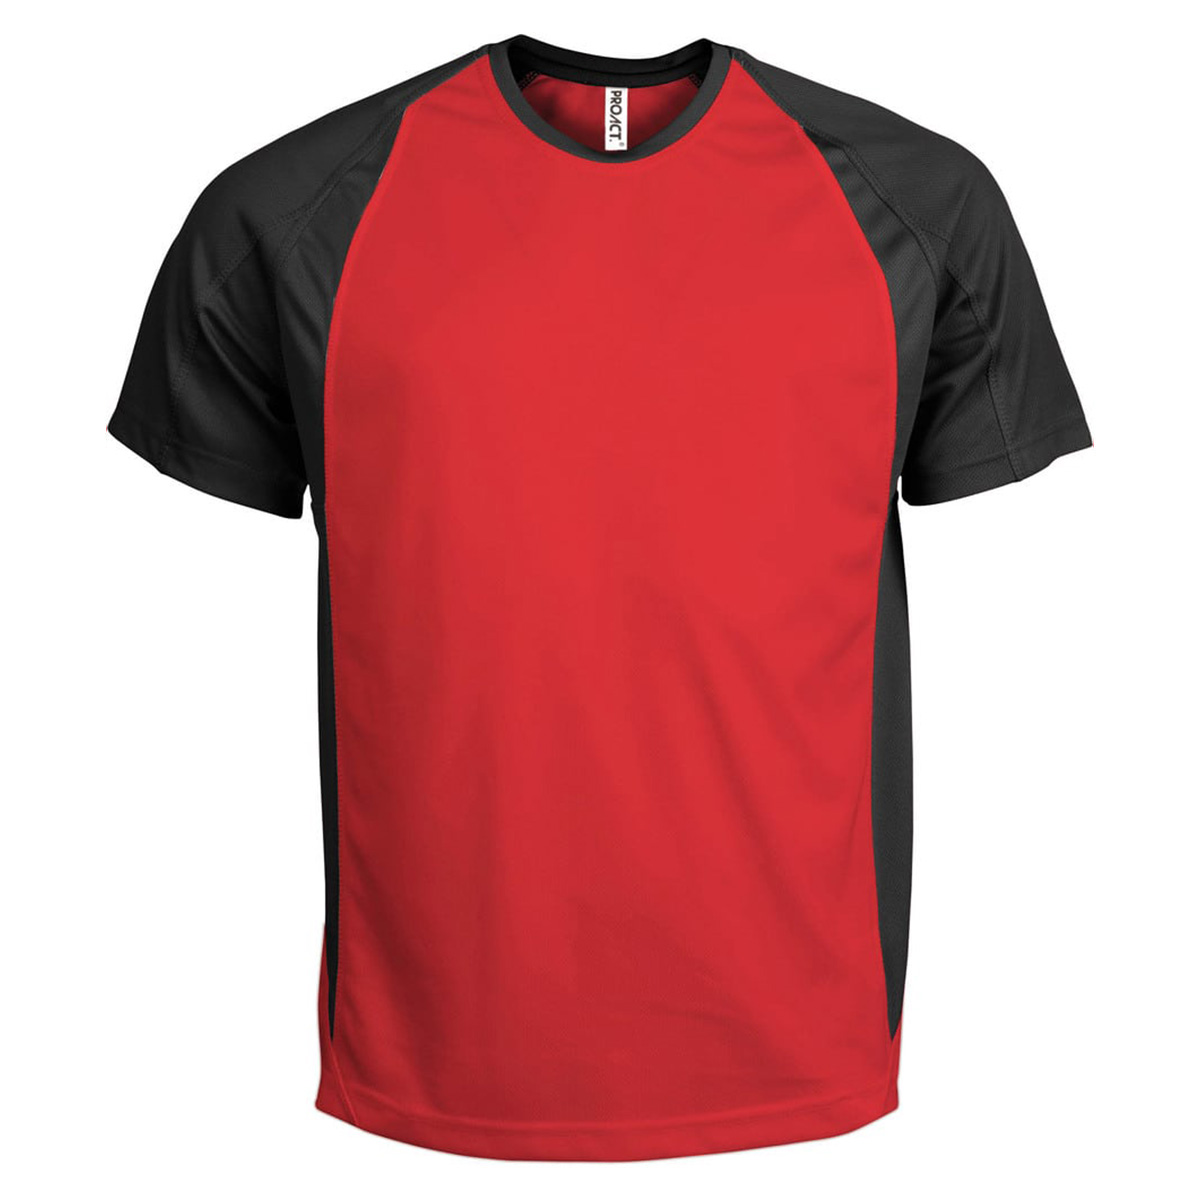 D01_pa467_red_black--0-0--c6ffc2c9-f685-4c22-9dfa-5ef6c75211fa